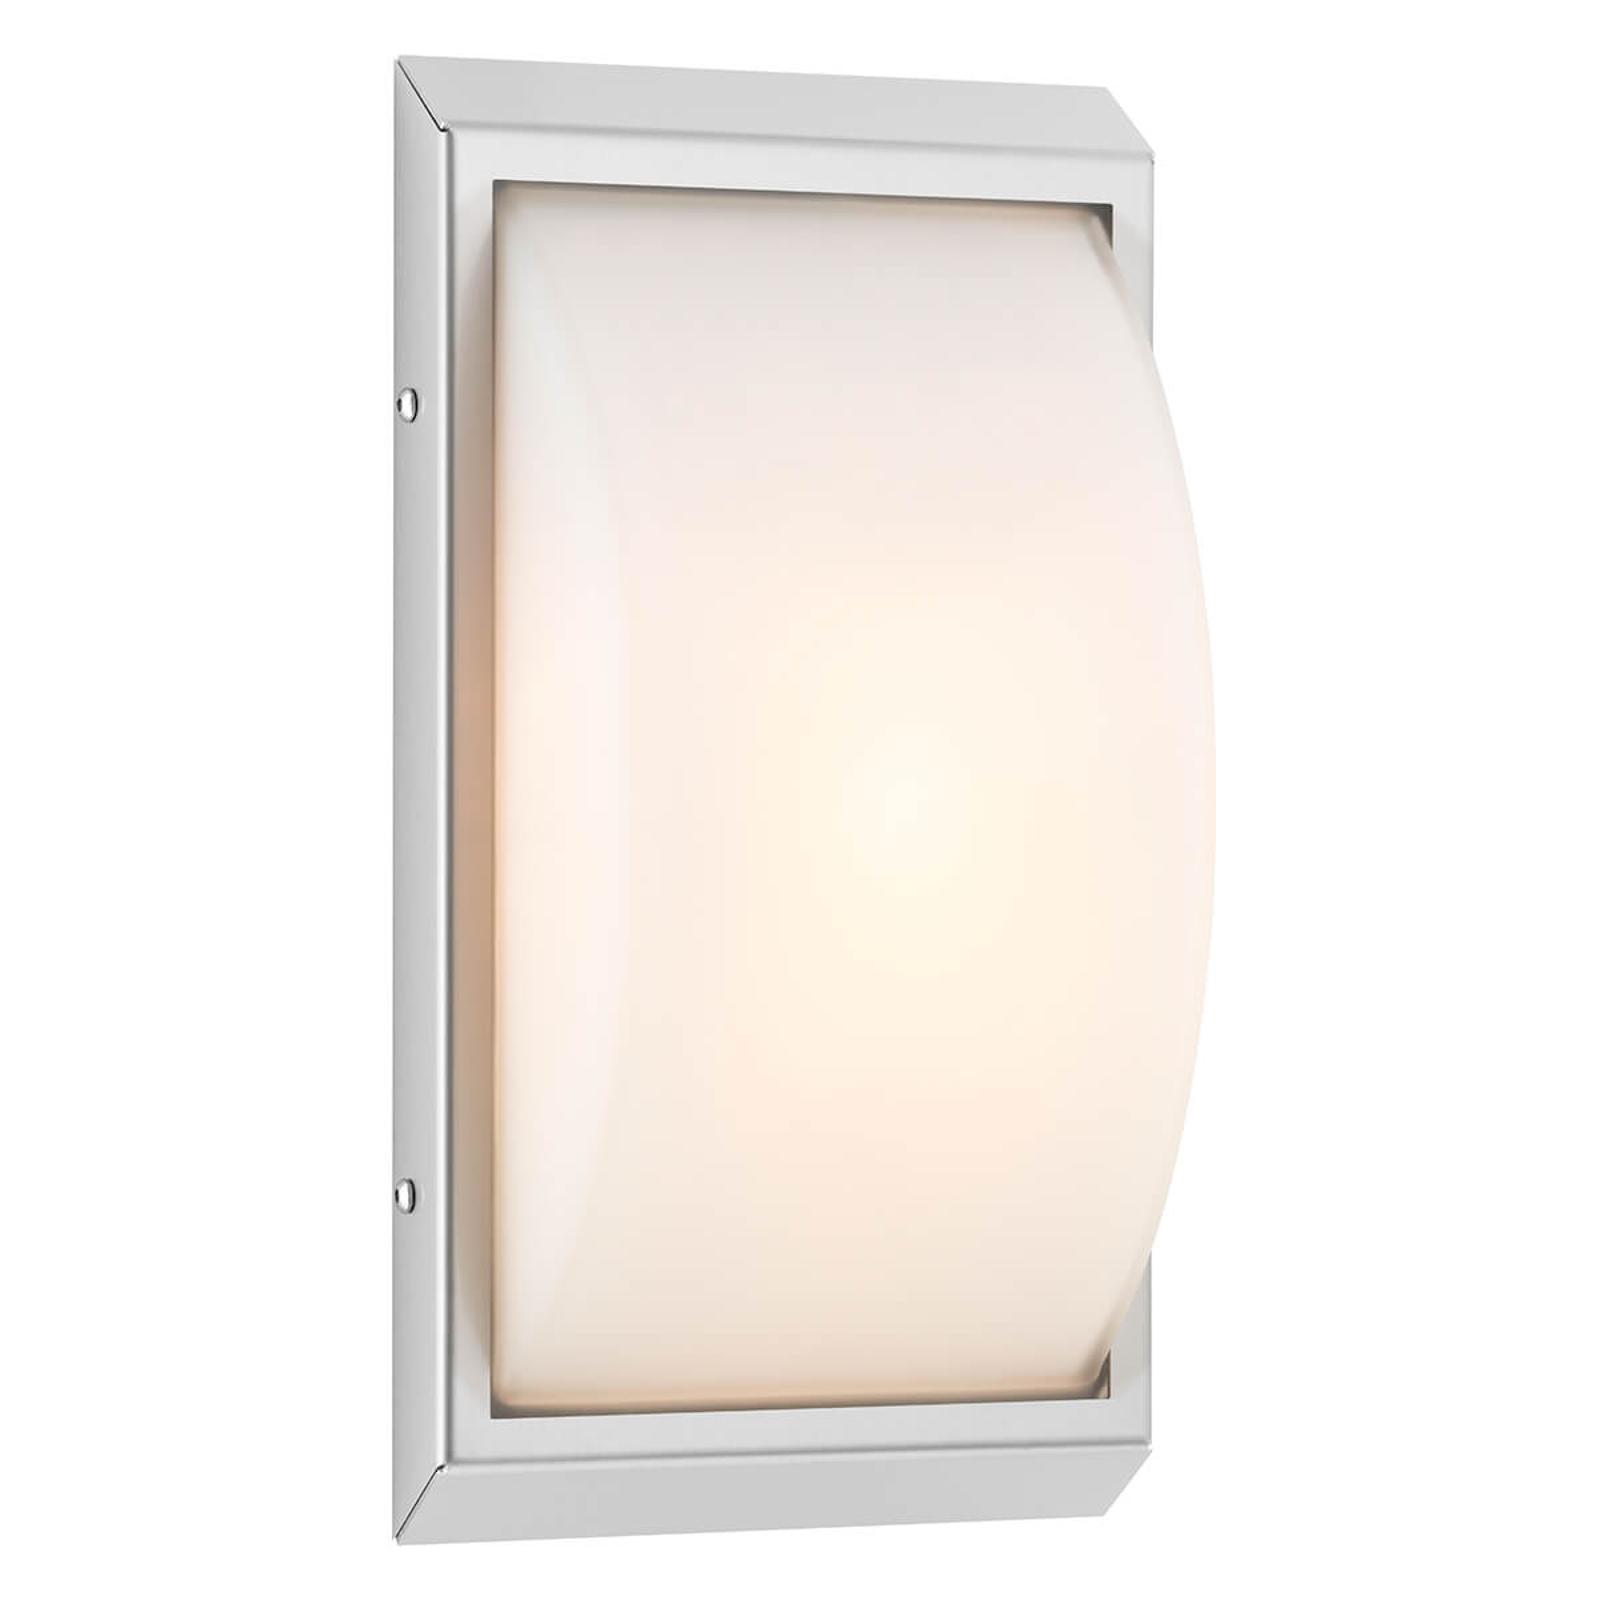 Met bewegingsmelder - buitenwandlamp Malte